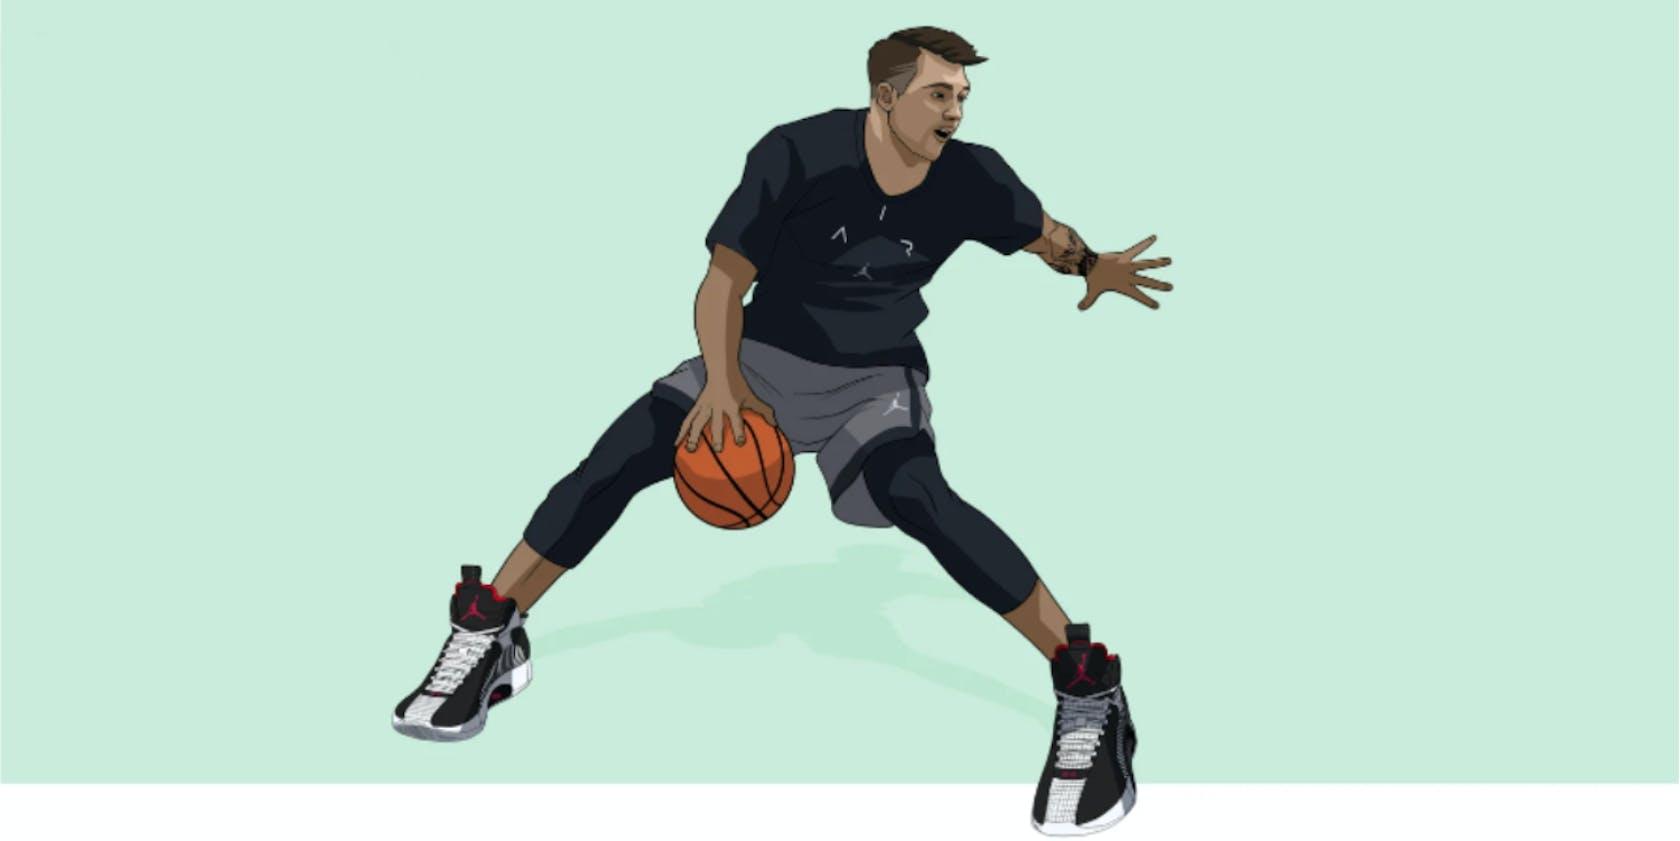 Nike Onlineshop Jordan